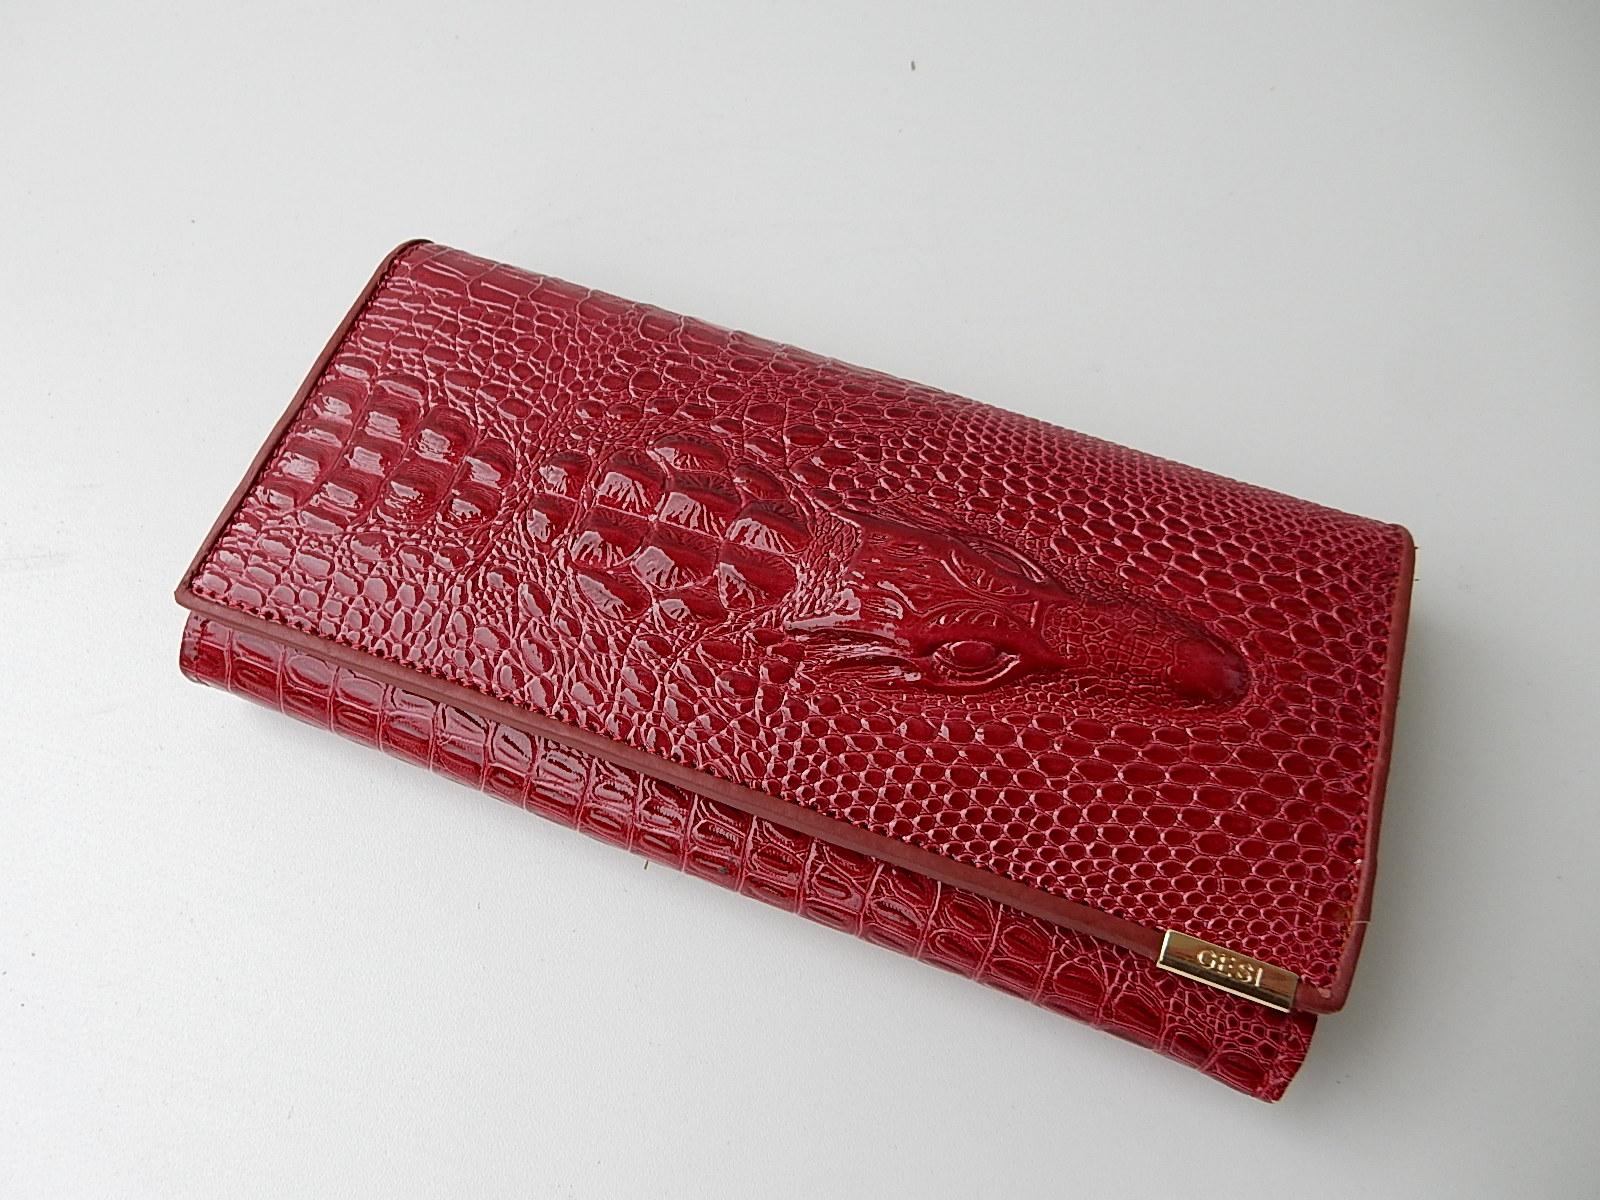 08e3e299016 Rode Gesilang Portemonnee met Krokodil | JouwVeilingen.nl webshop